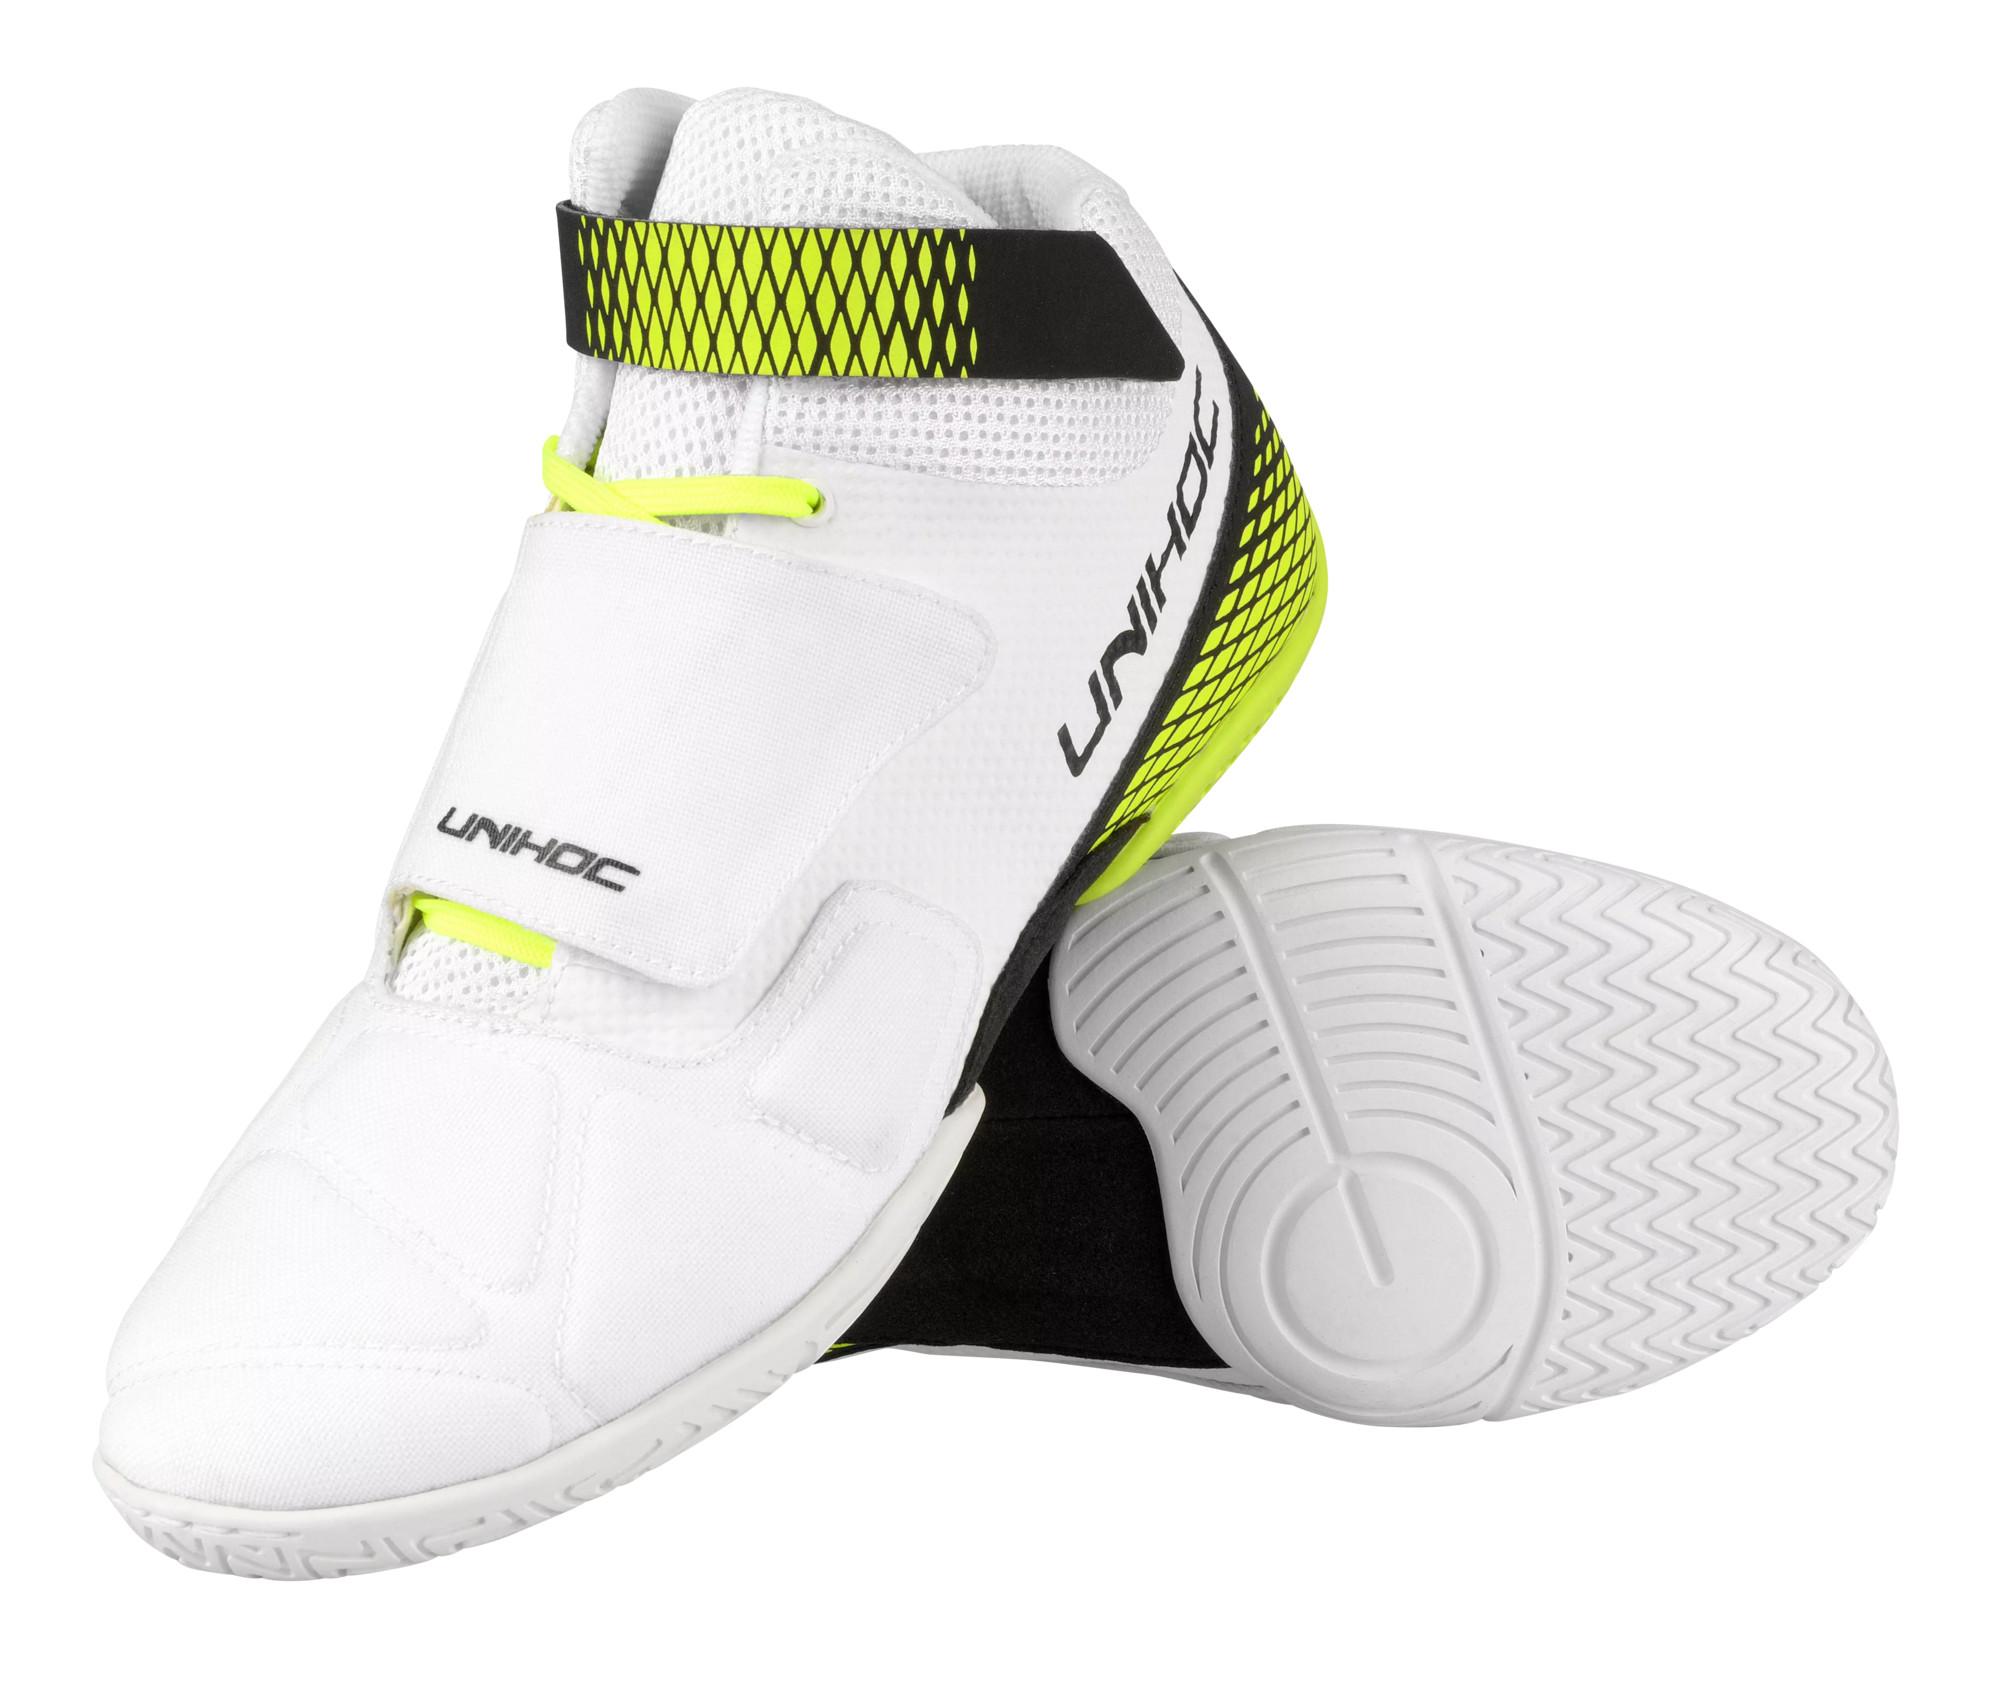 Unihoc U4 Goalie white/neon yellow bílá / neonově žlutá, UK 4, EU 37, US 5, 23,5 cm